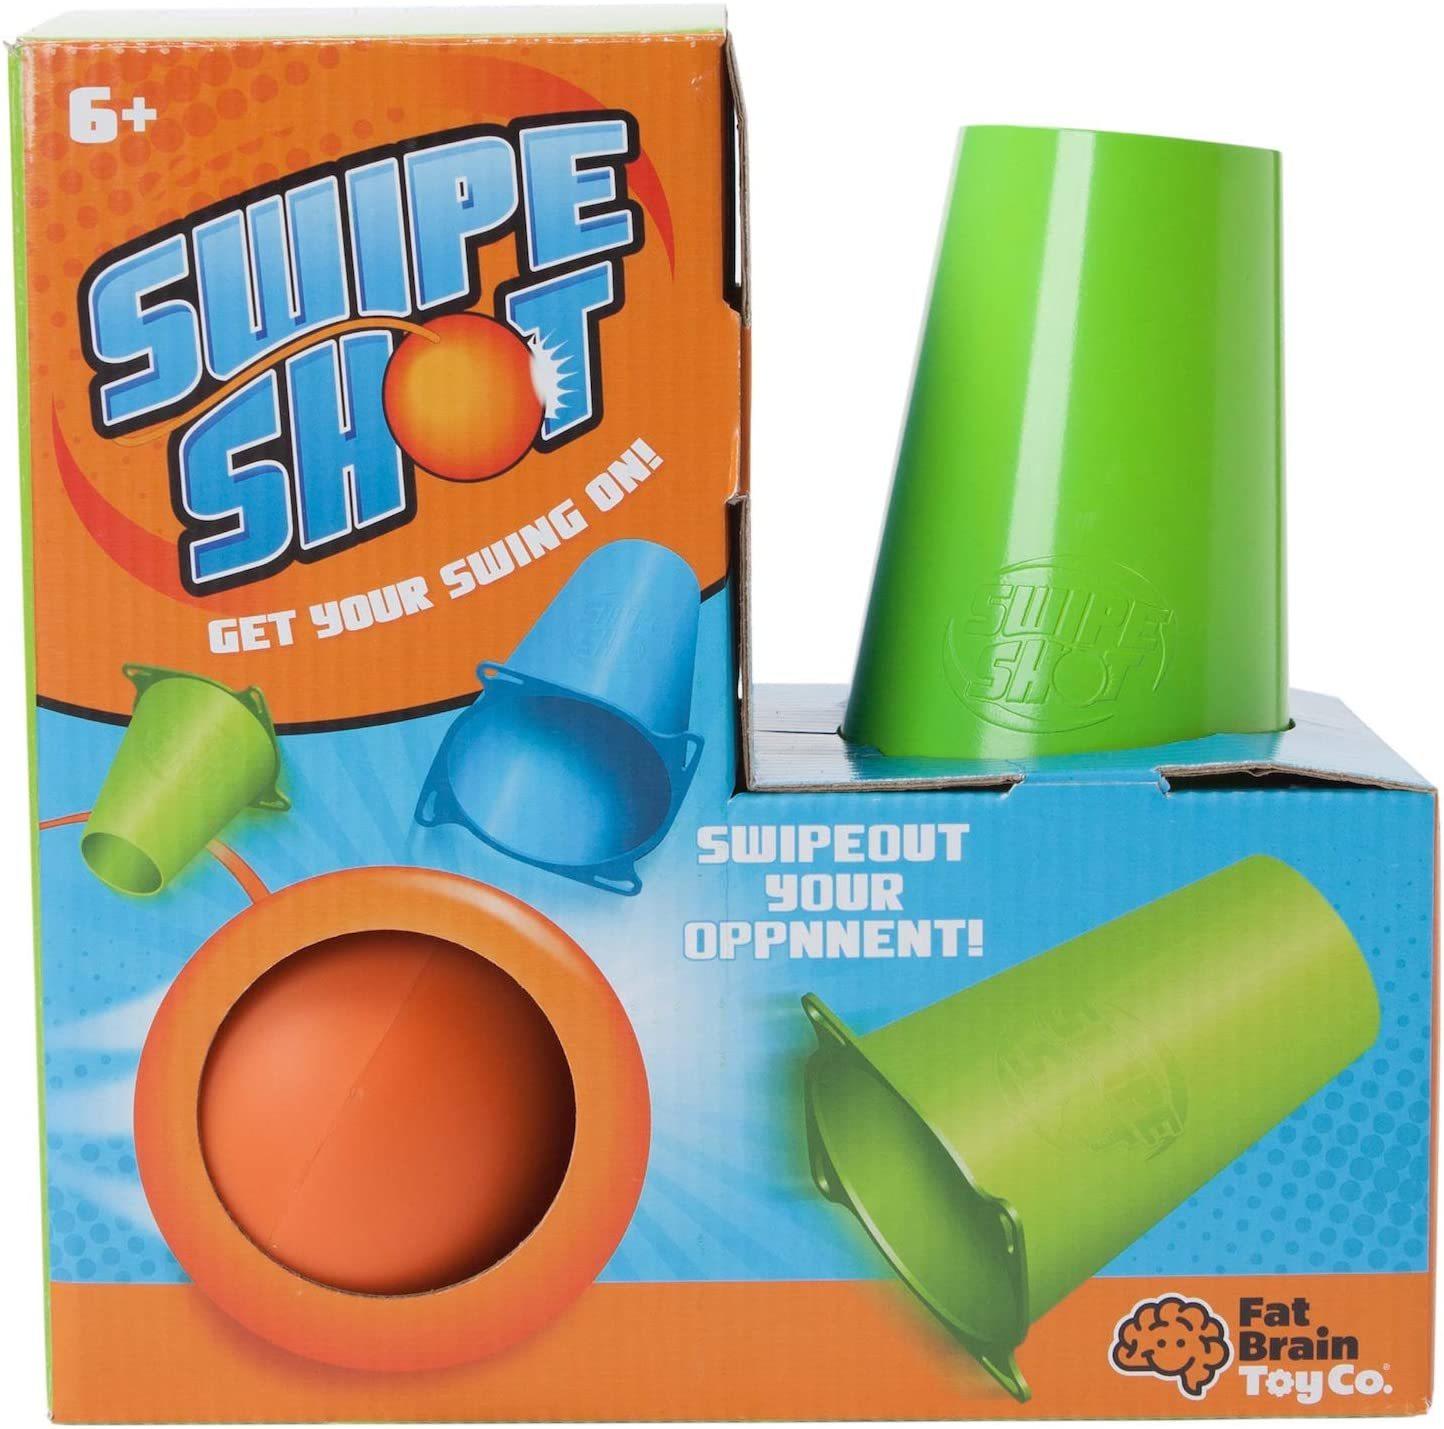 Fat Brain Toys: Swipe Shot image